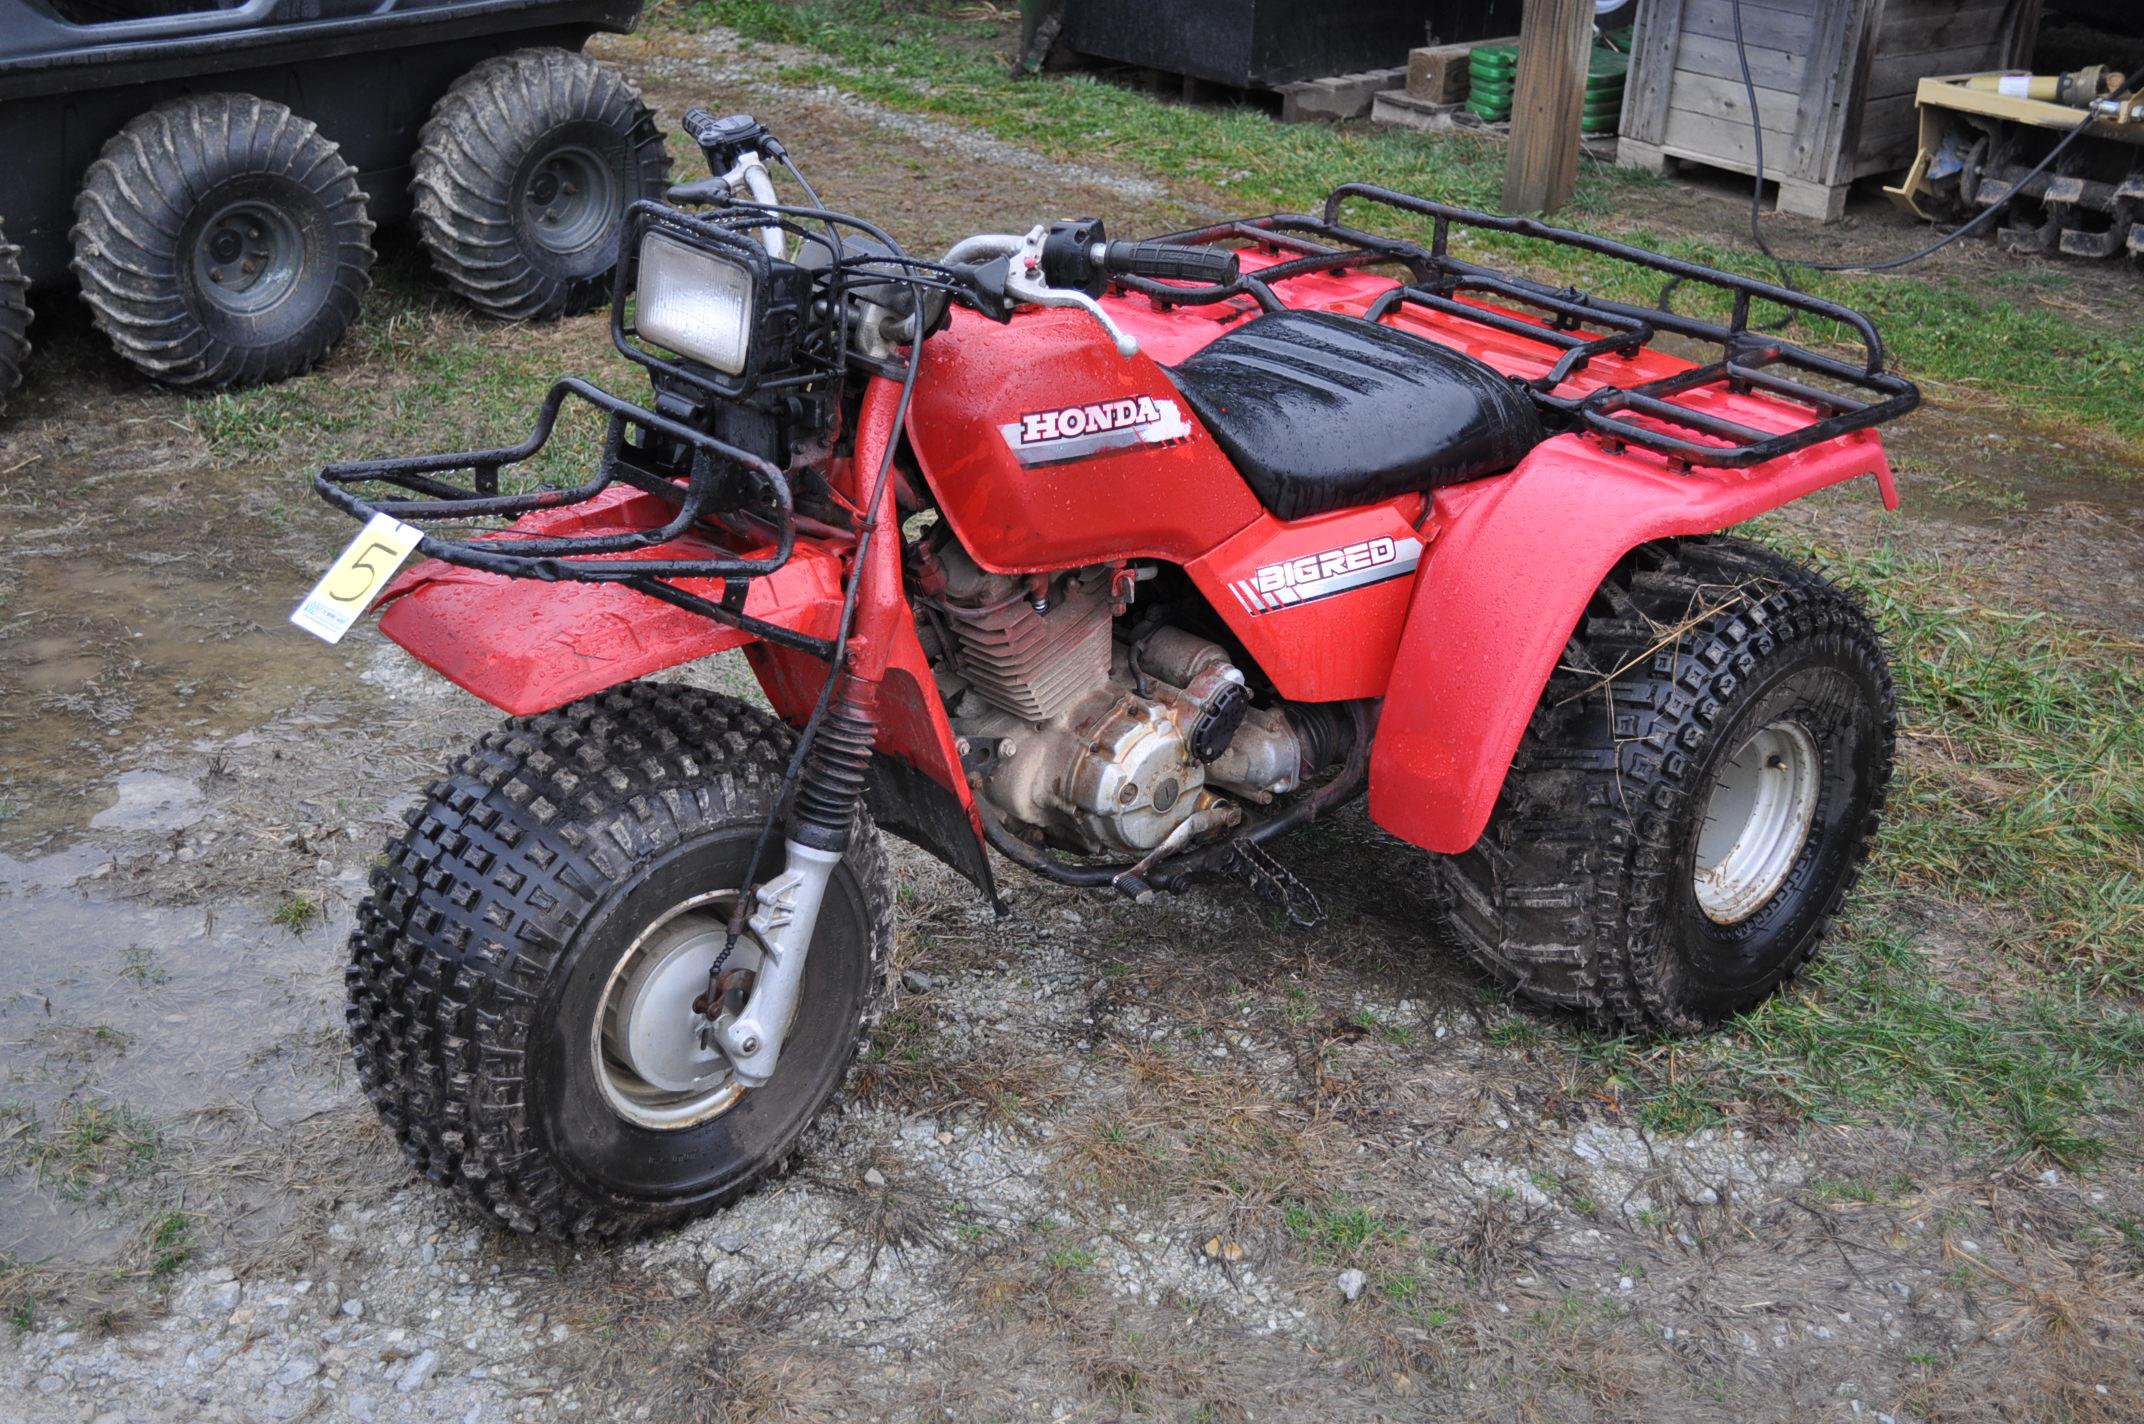 Honda Big Red 3-wheeler, new 25 x 12.00-9 tires